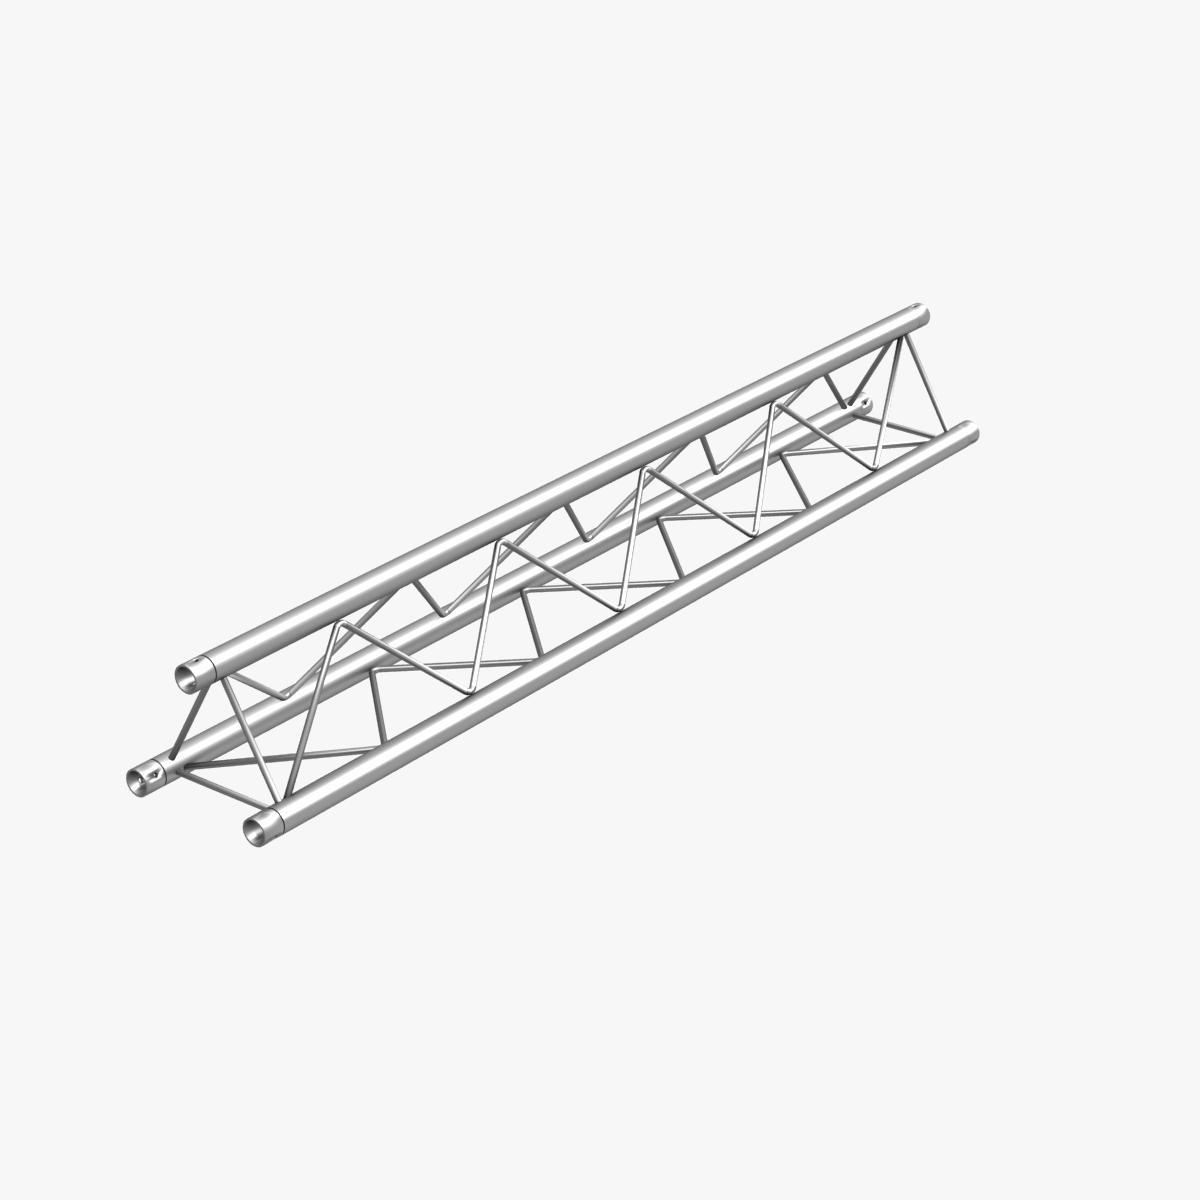 triangular trusses (collection 55 modular pieces) 3d model 3ds max dxf fbx c4d dae texture obj 216253